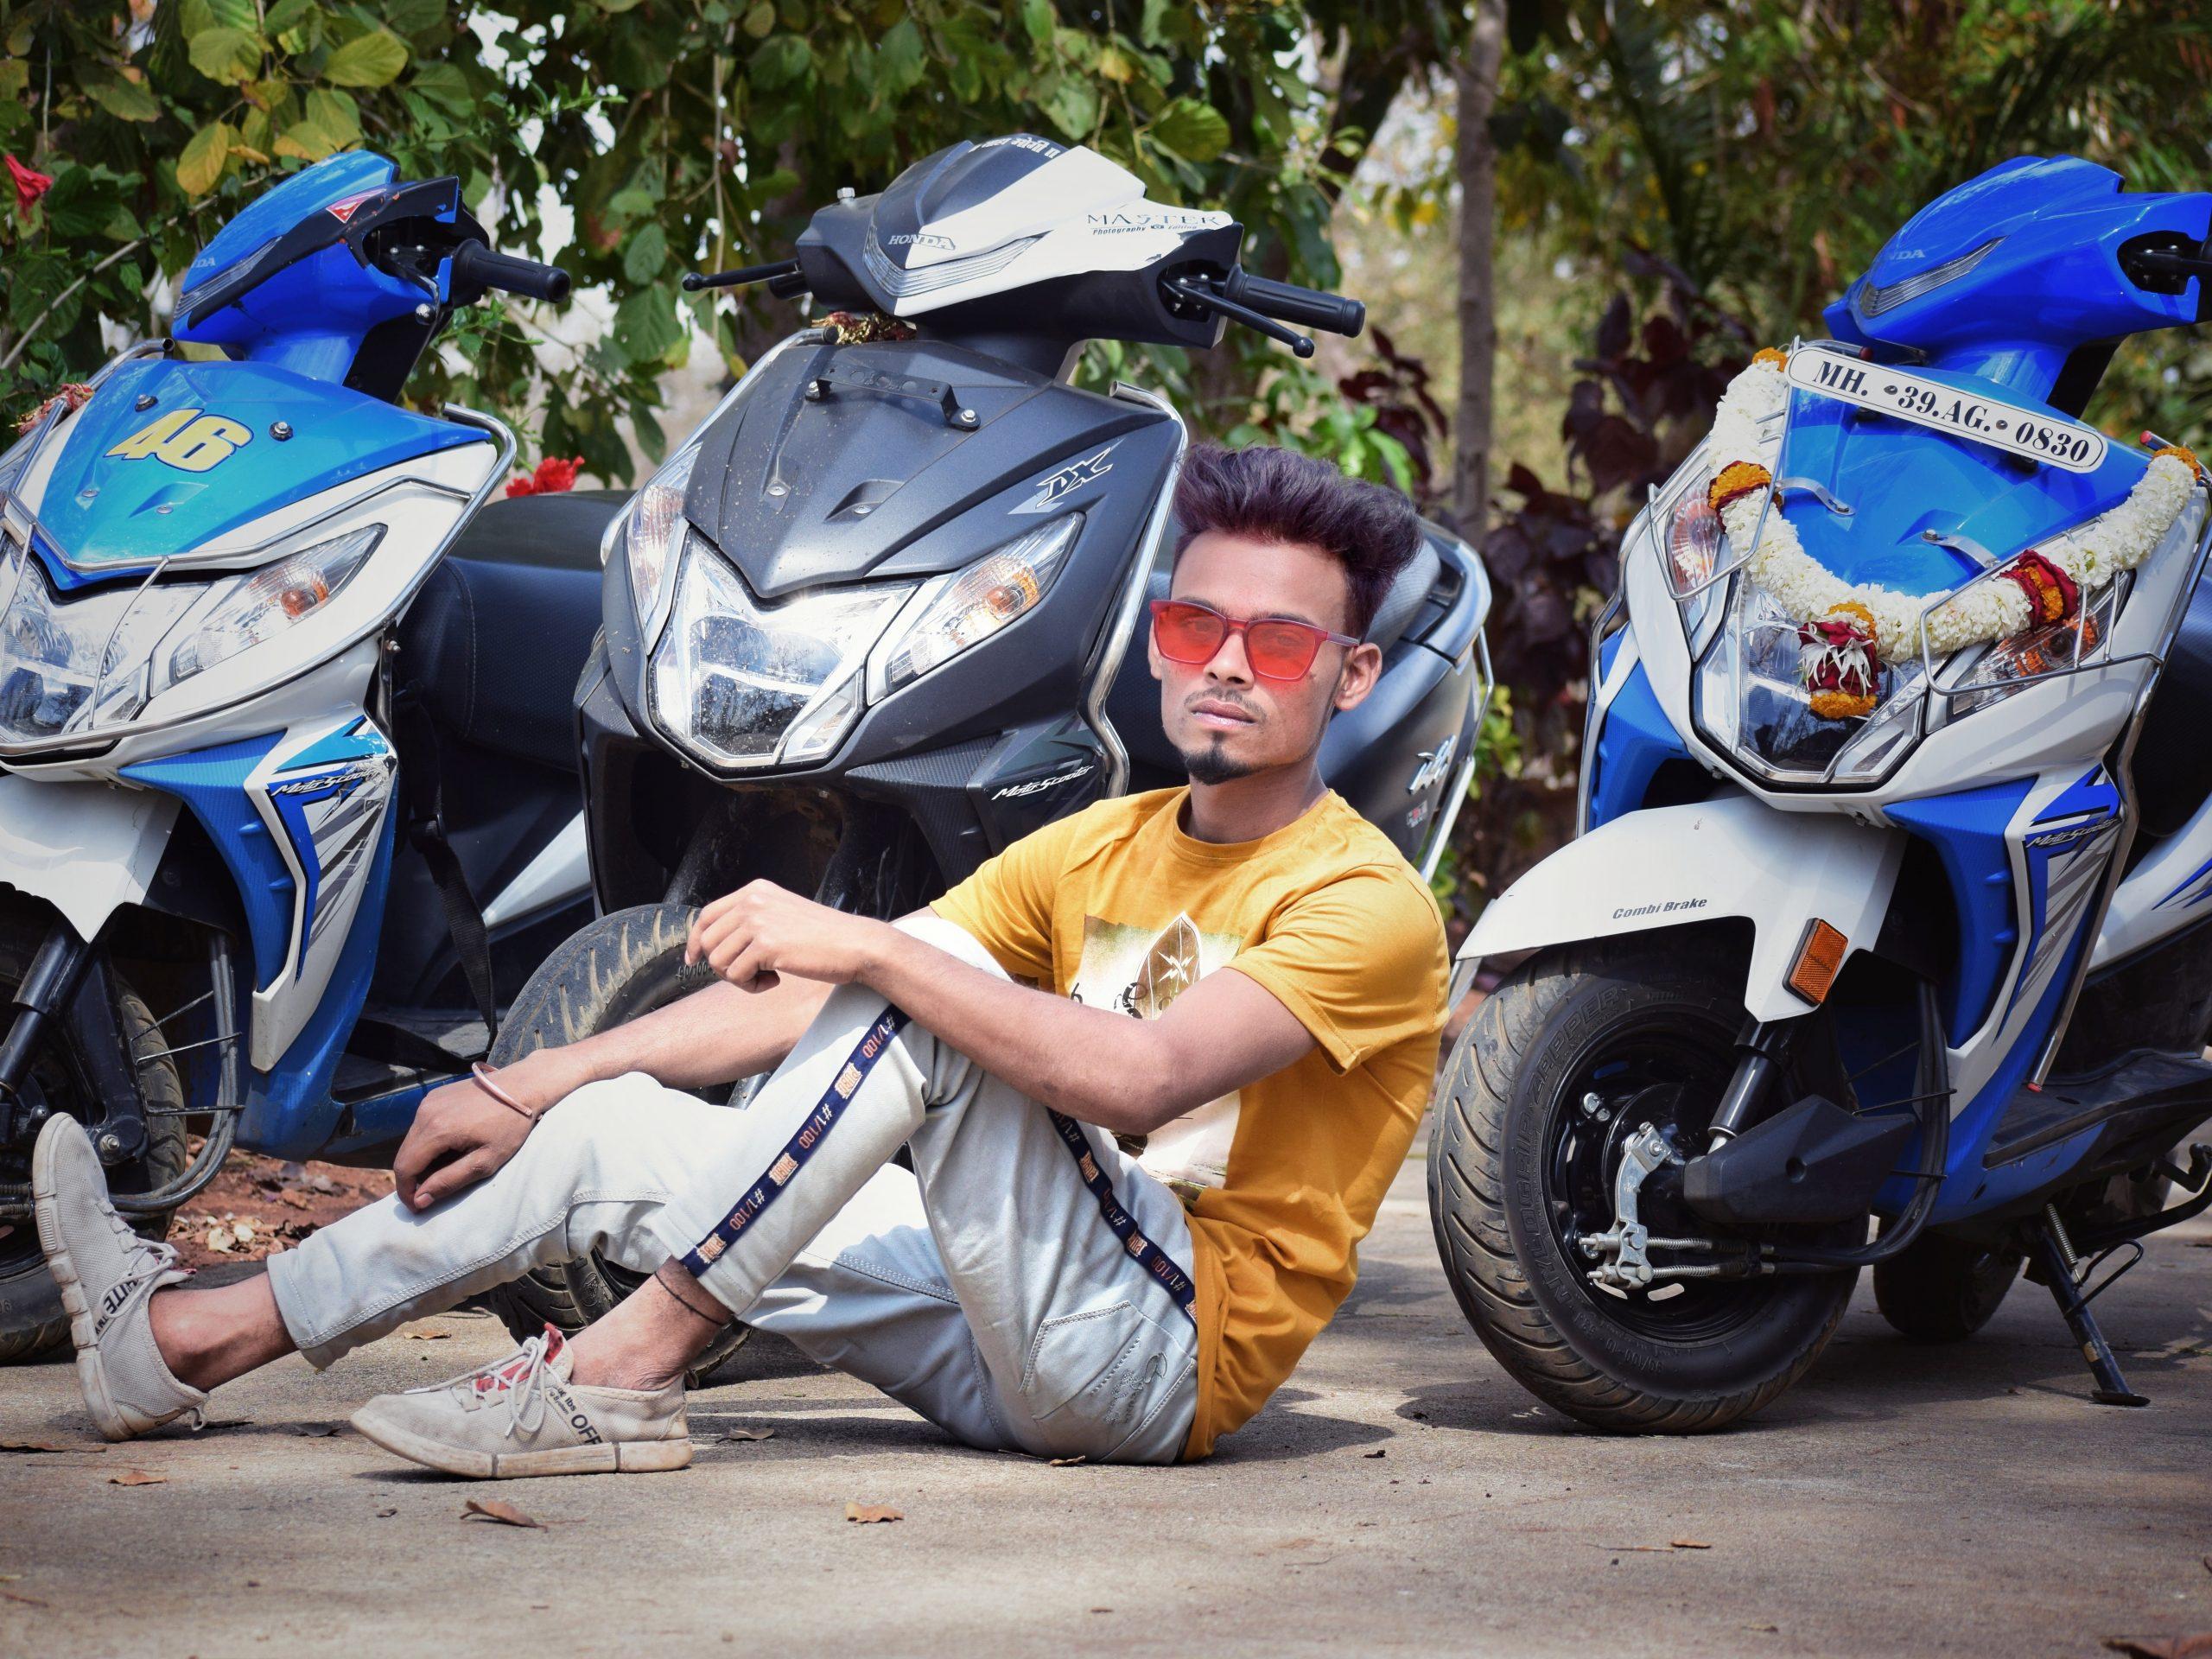 A stylish boy near scooters